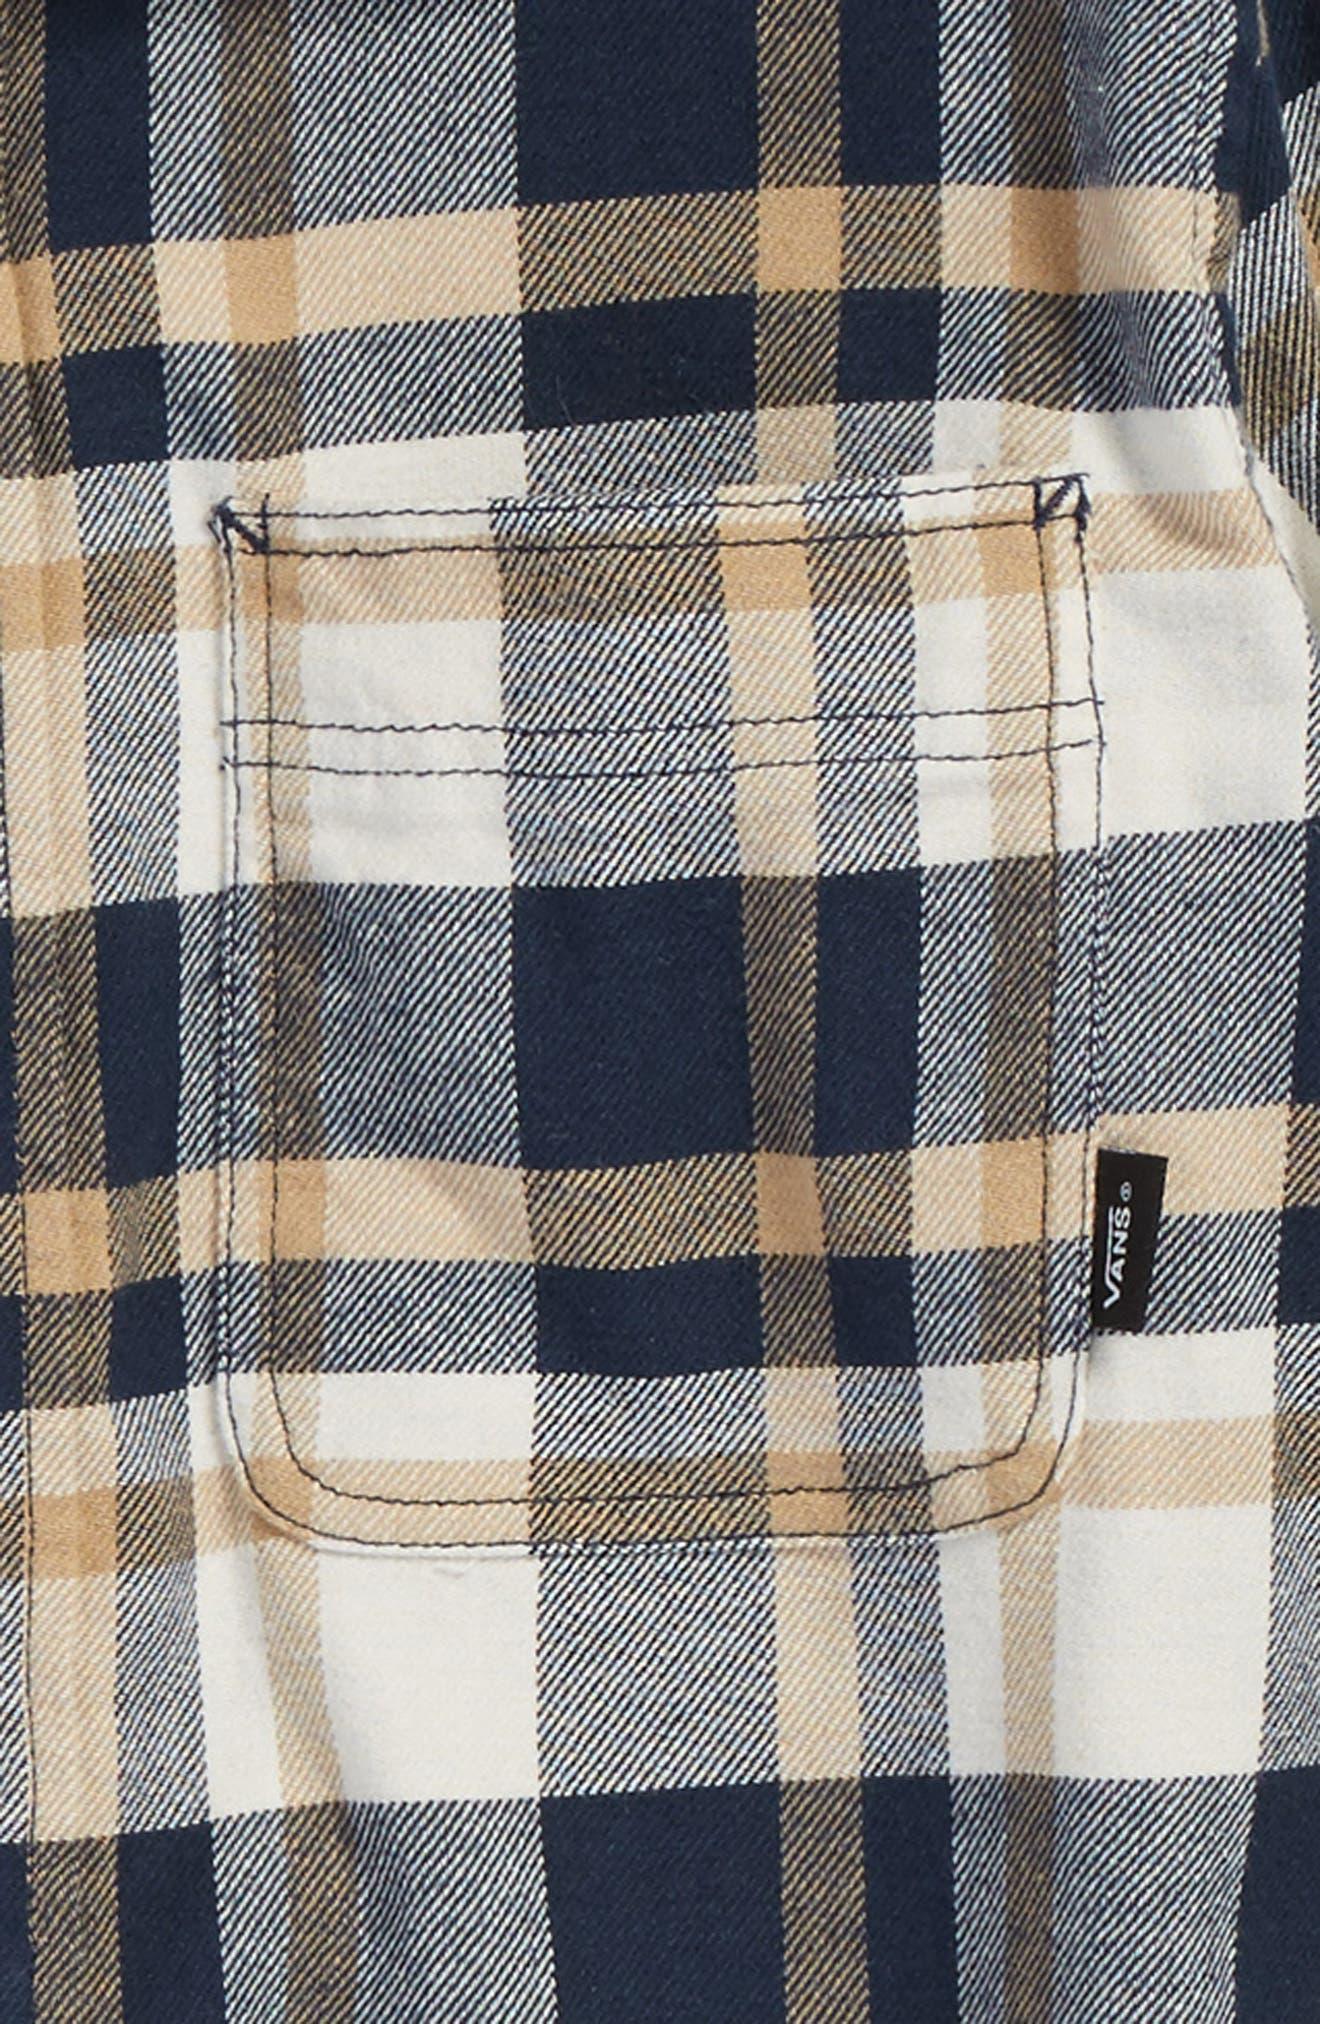 Banfield Plaid Flannel Shirt,                             Alternate thumbnail 2, color,                             401